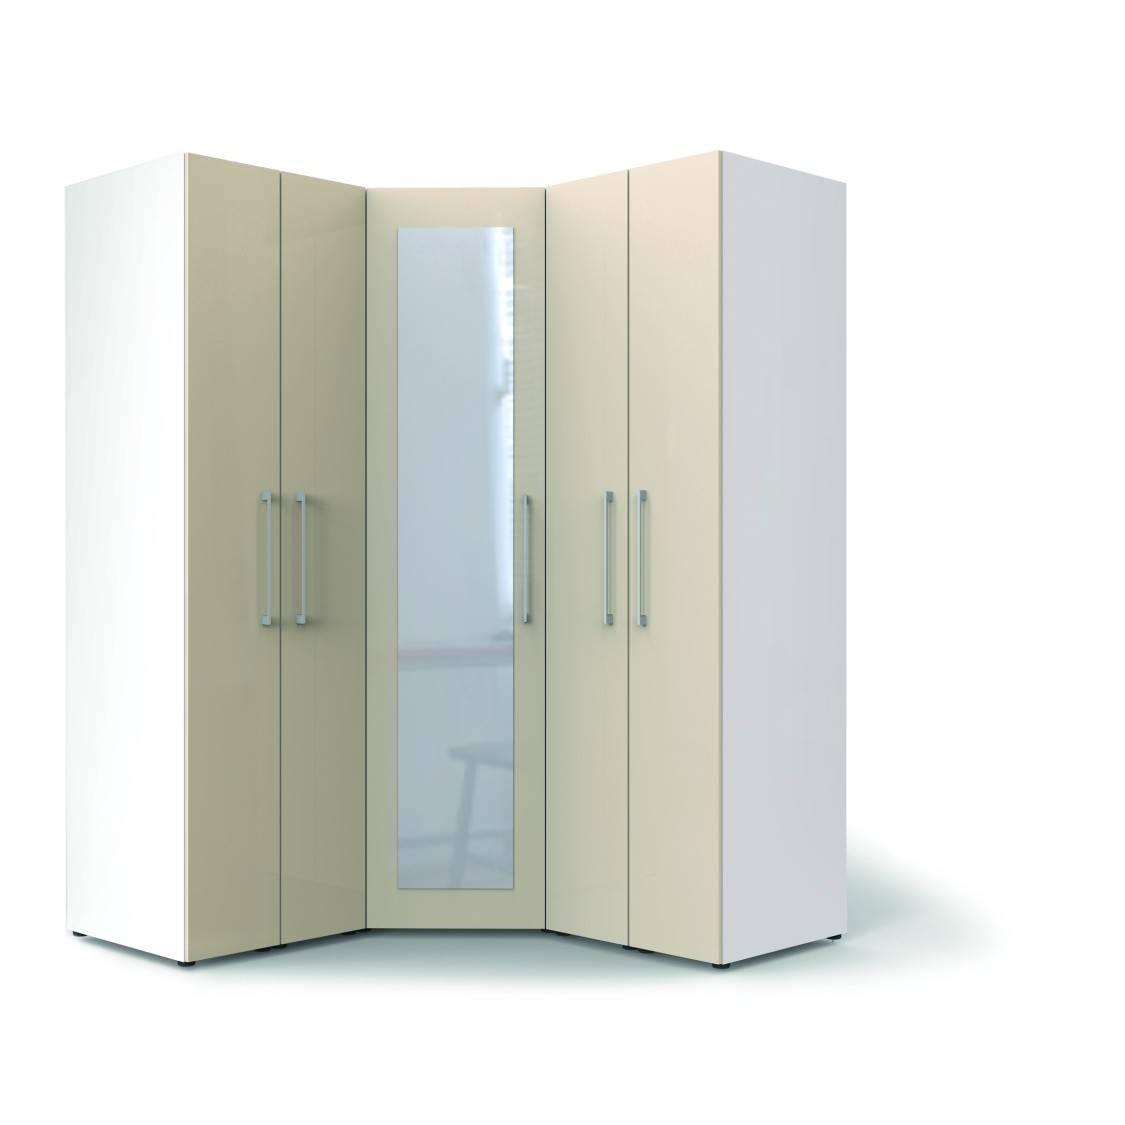 Corner Wardrobe Uk | Hallway Furniture Ideas with Corner Wardrobes (Image 3 of 15)